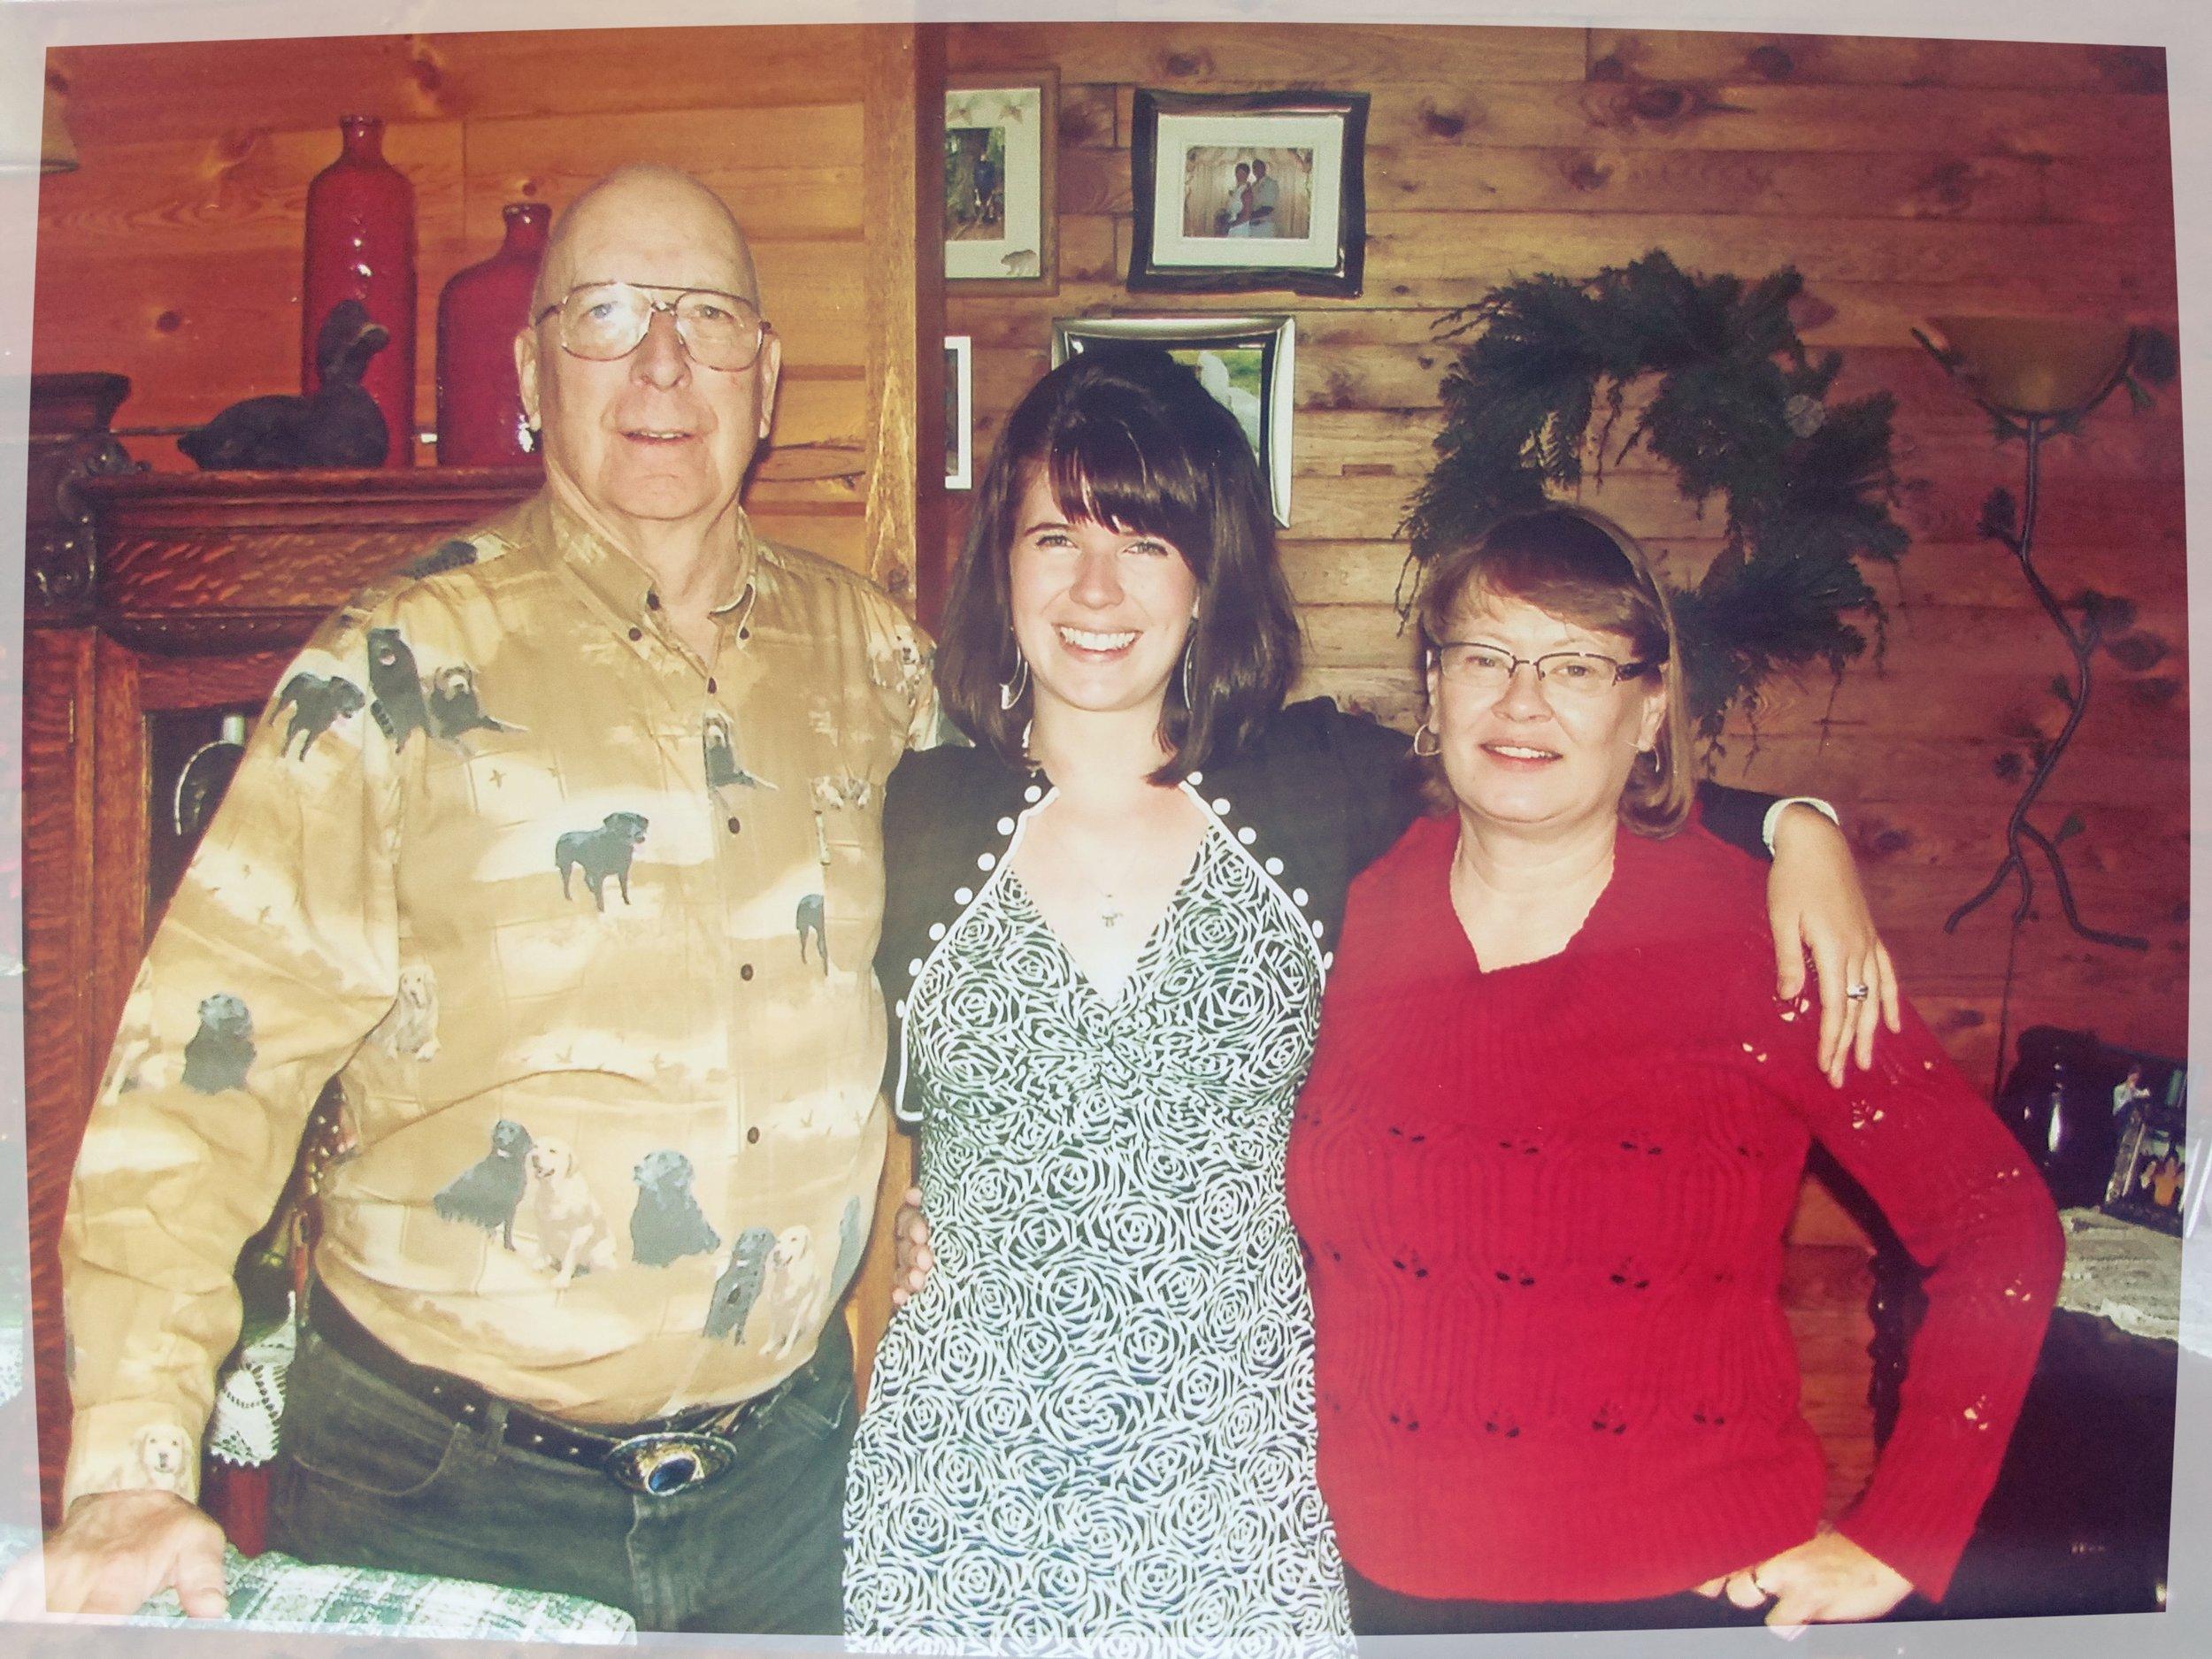 Grandpa and Grandma Jensen with their favorite first-born granddaughter